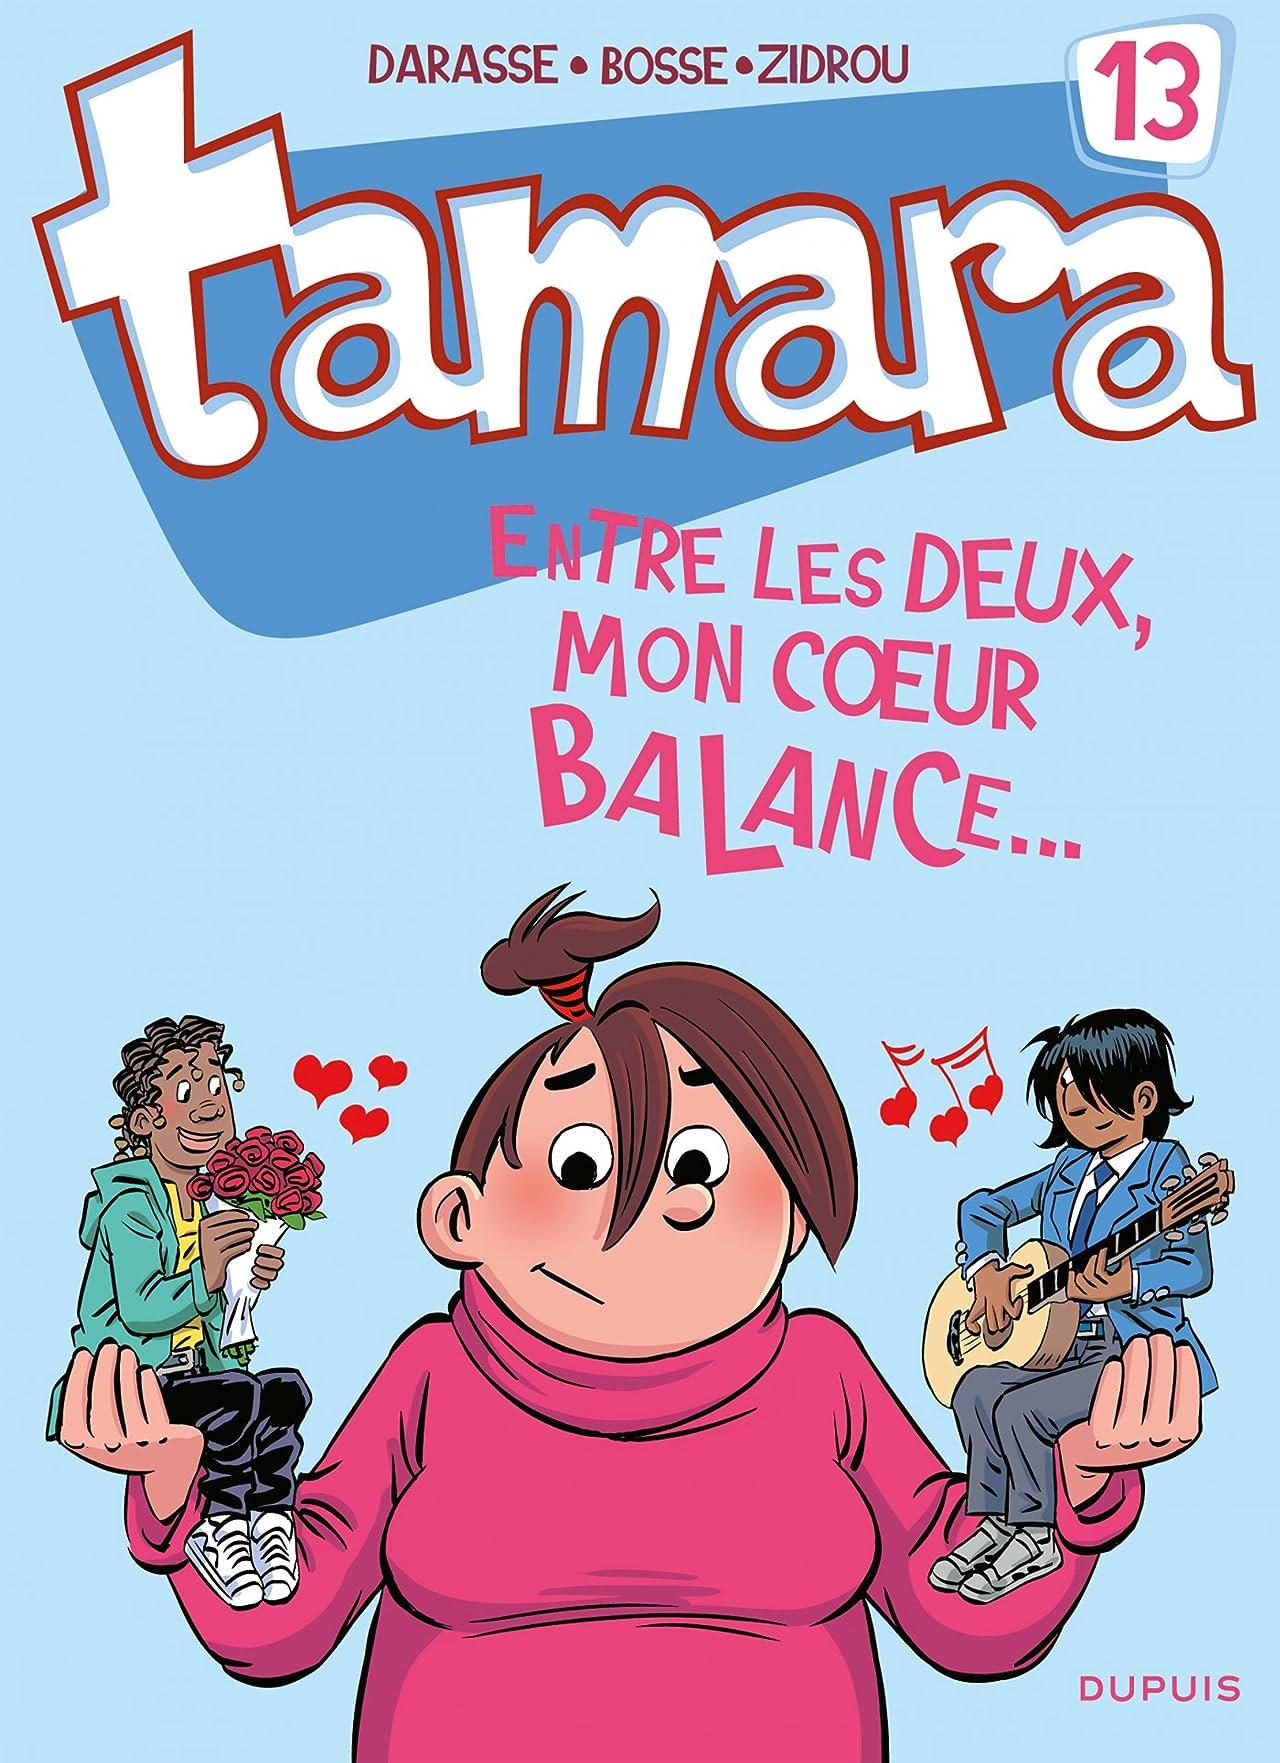 Tamara Vol. 13: Entre les deux, mon coeur balance...